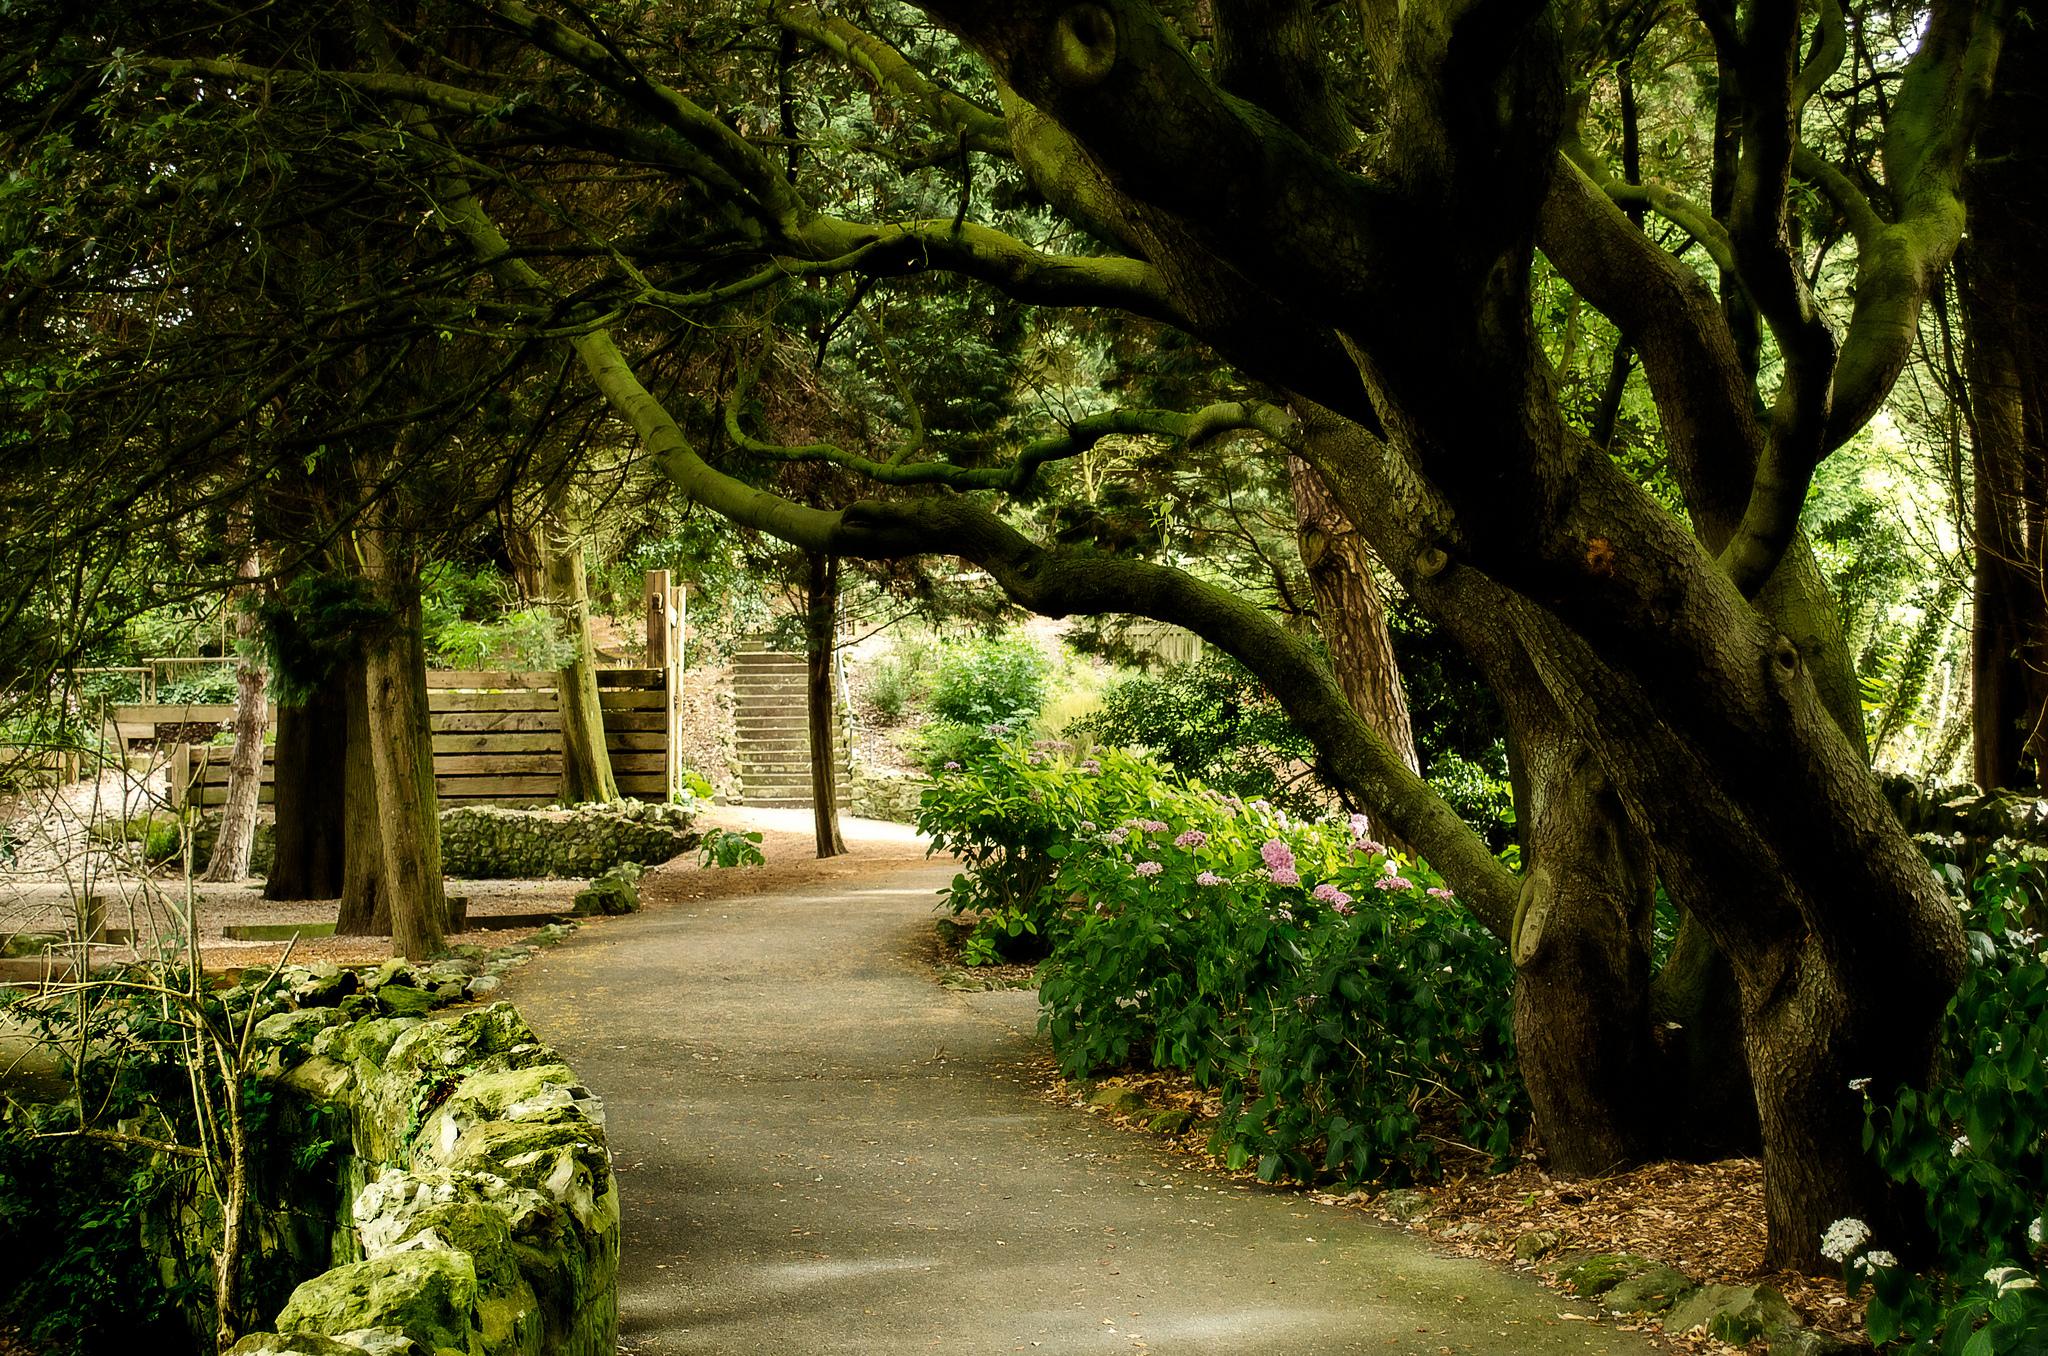 Ventnor Botanic Garden 2013 - 09